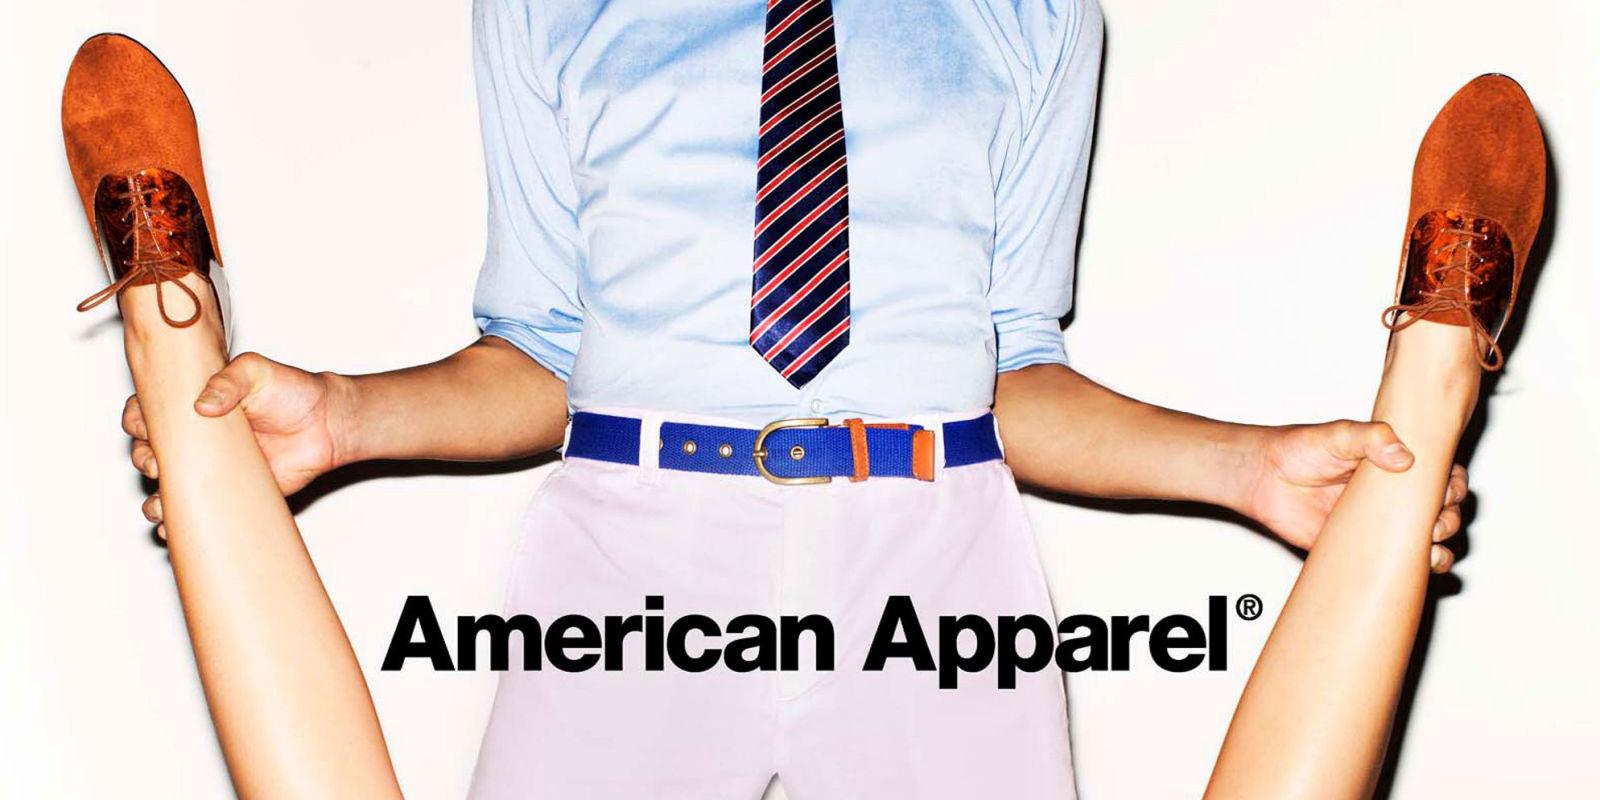 landscape-1444075022-american-apparel